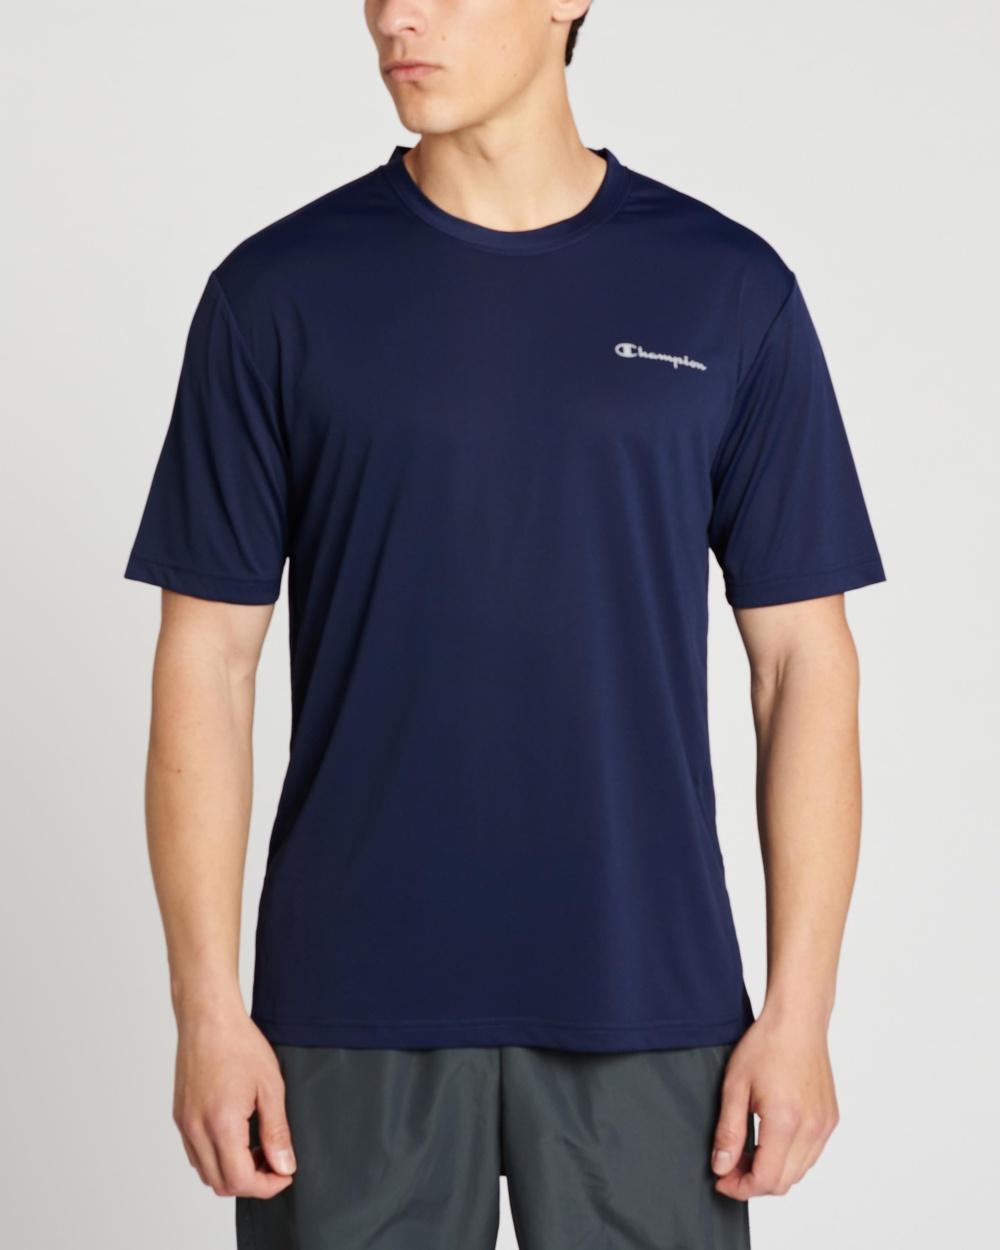 Champion Performance Micro Tee Short Sleeve T-Shirts Navy Australia